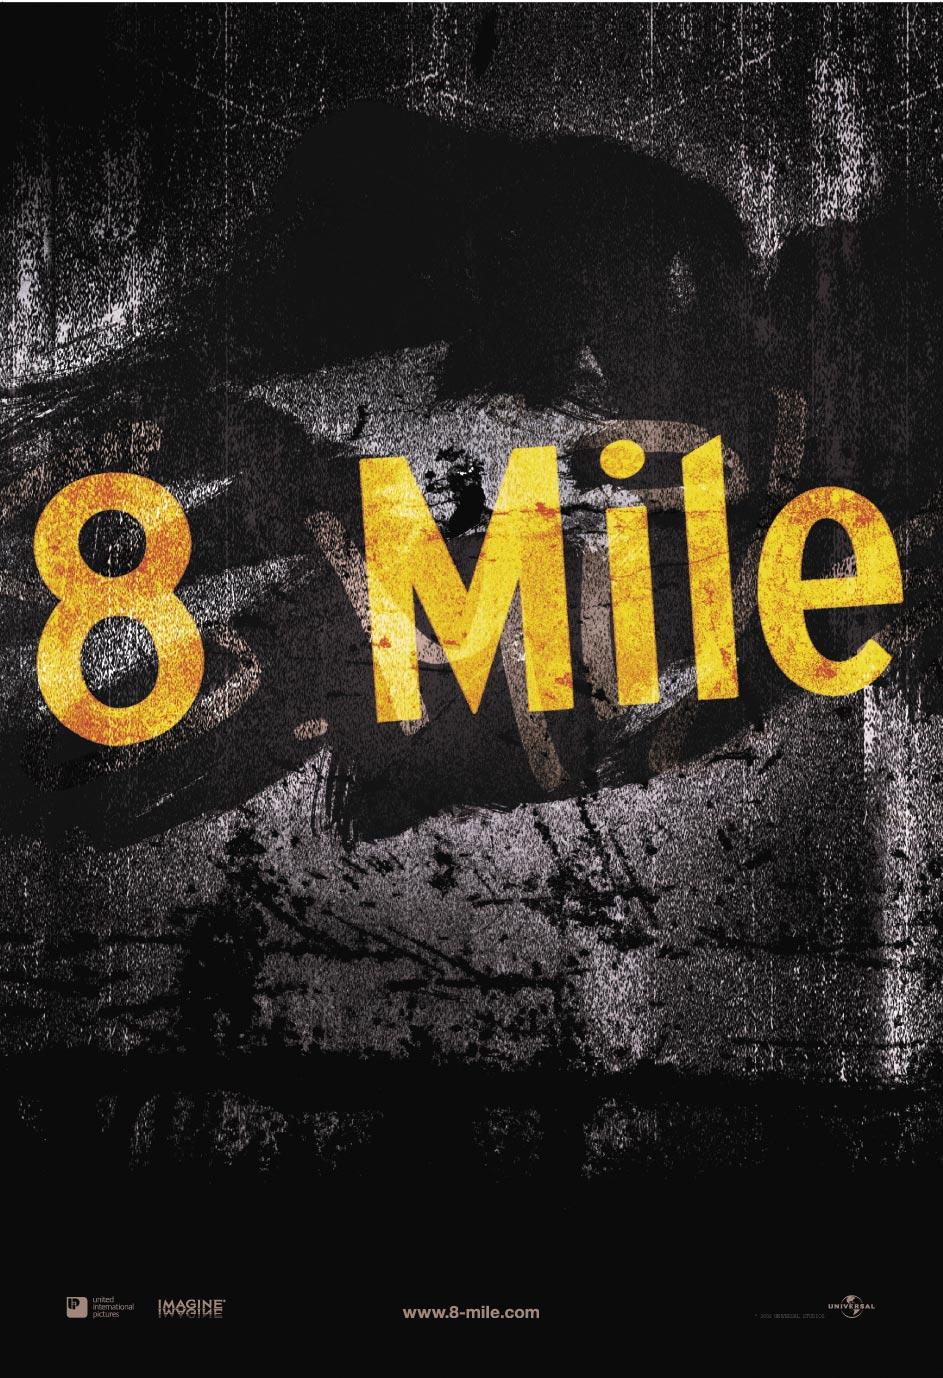 Фильм на телефон 8 миля